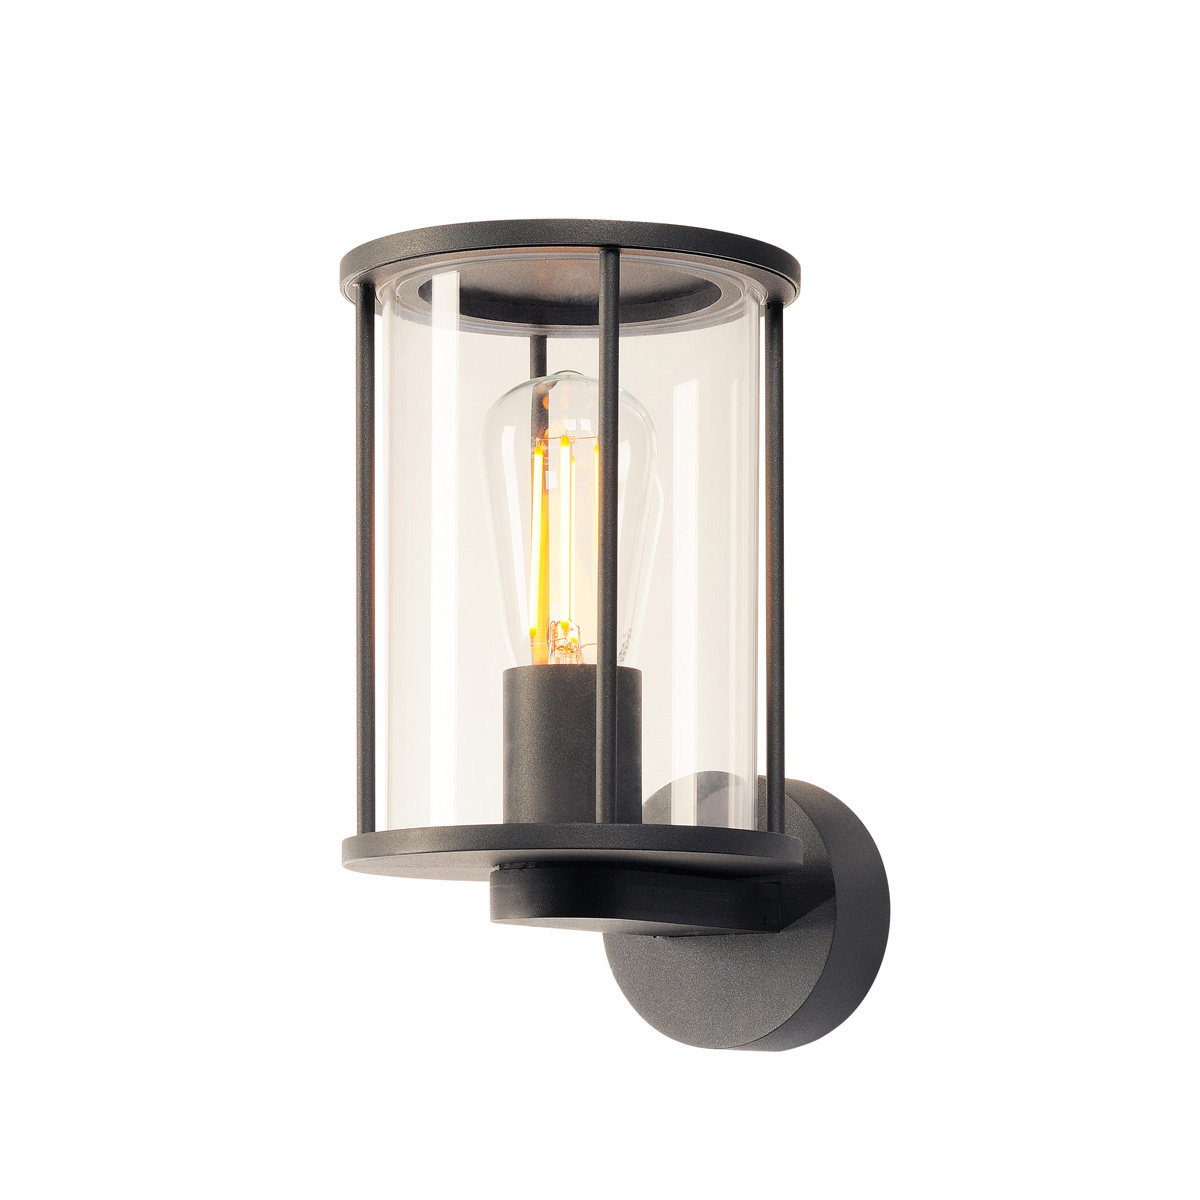 Moderne strakke wandlamp